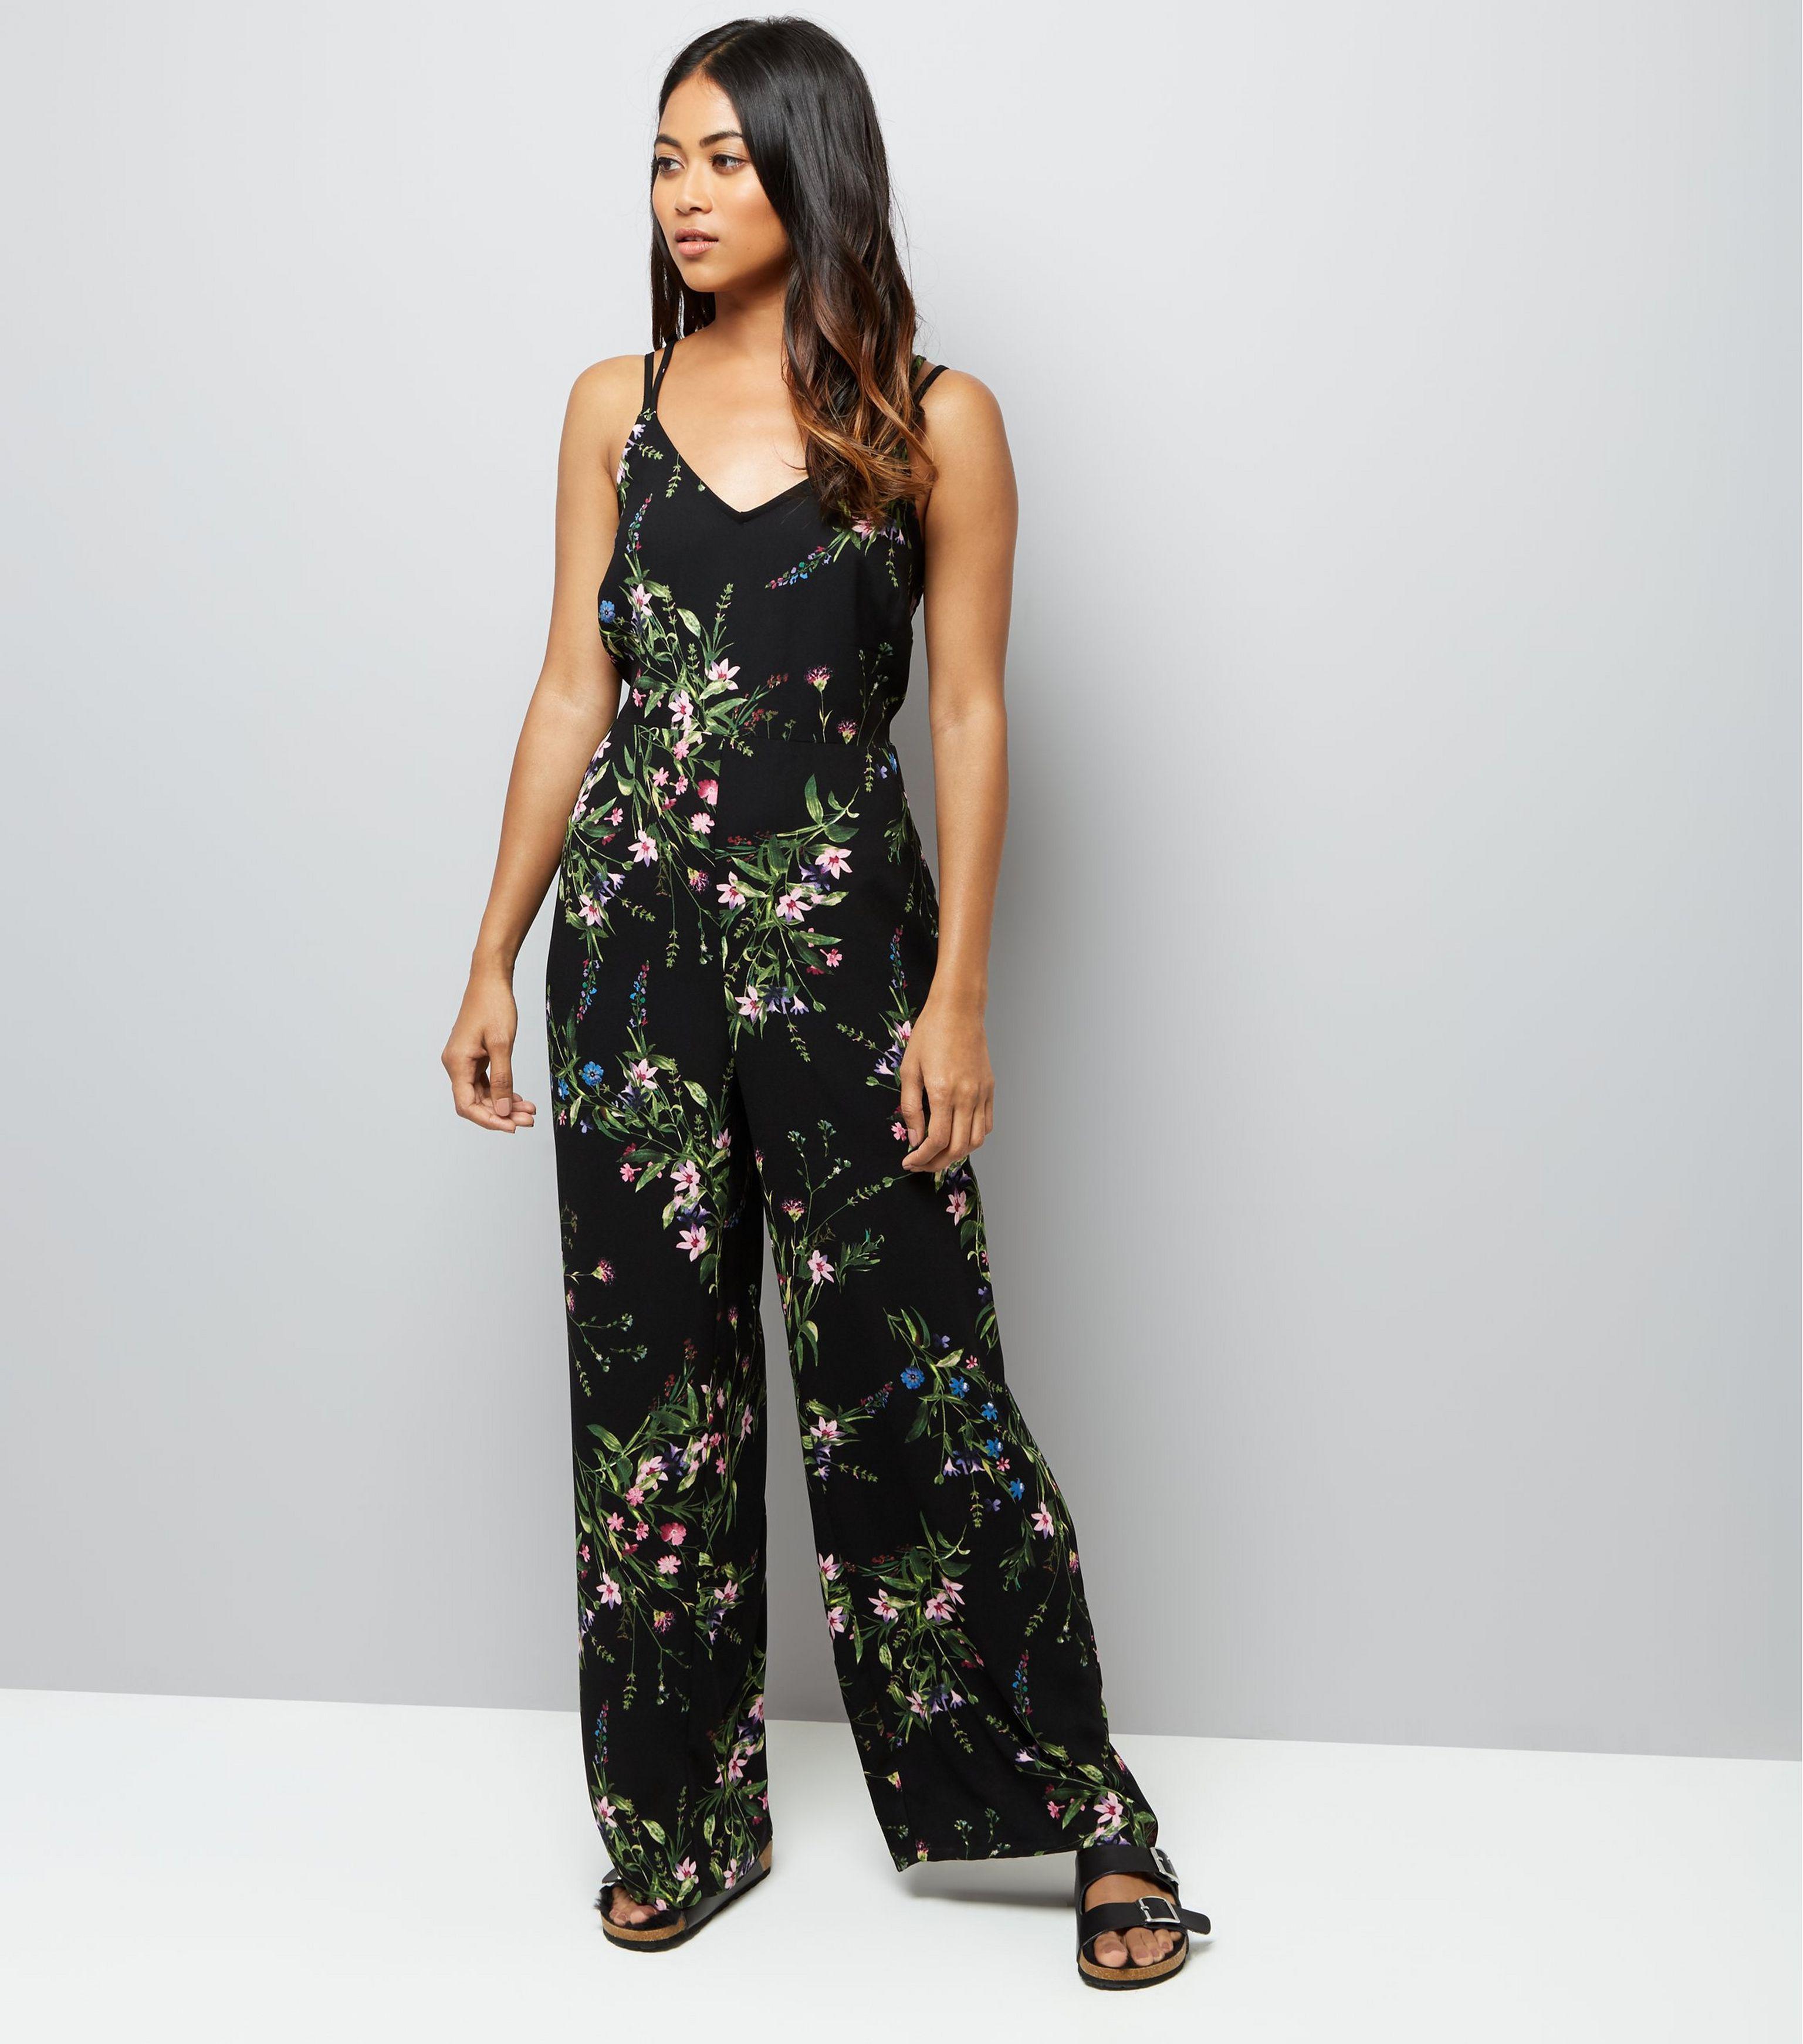 635dab8e7a New Look Petite Black Floral Print Wide Leg Jumpsuit in Black - Lyst